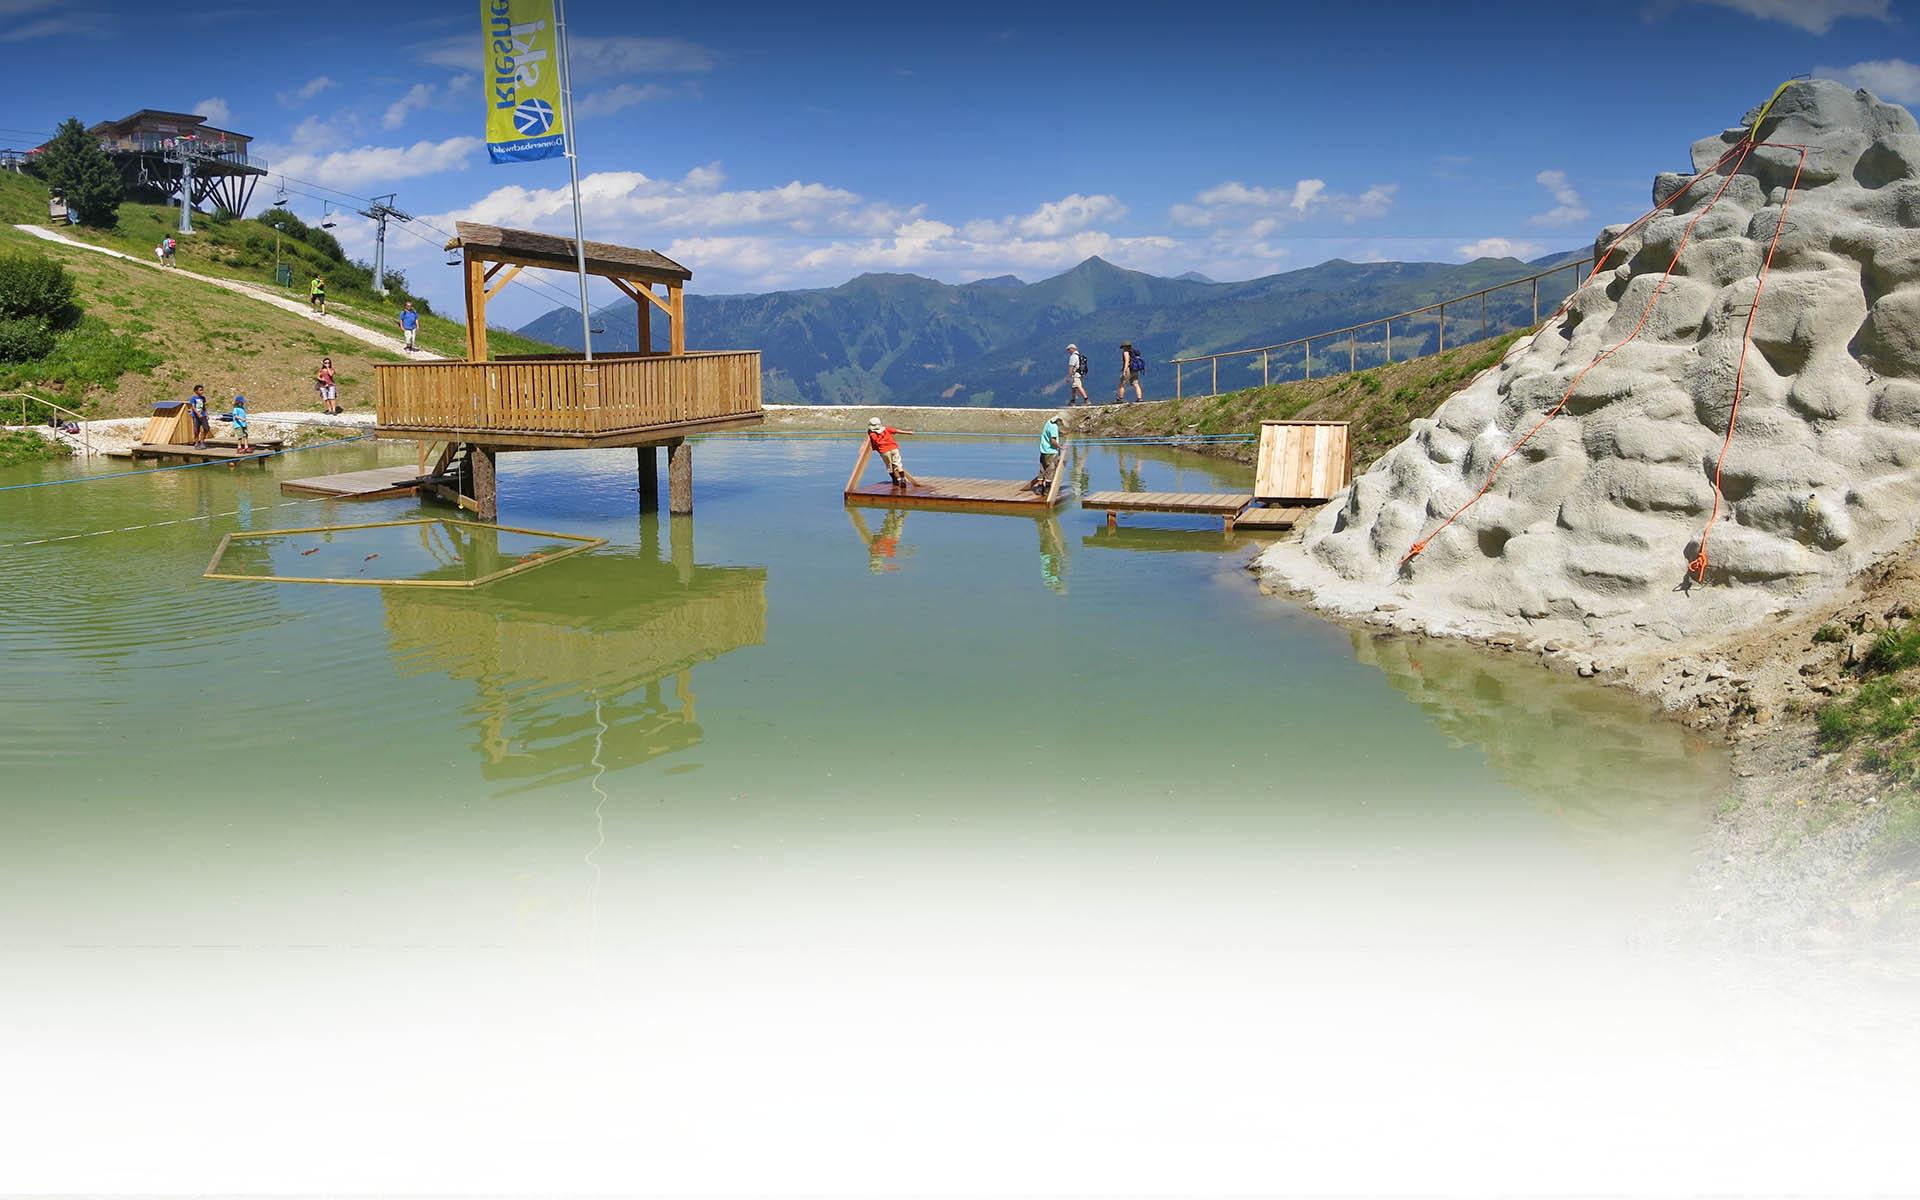 riesneralm-bergbahnen-sommer-wandern-2